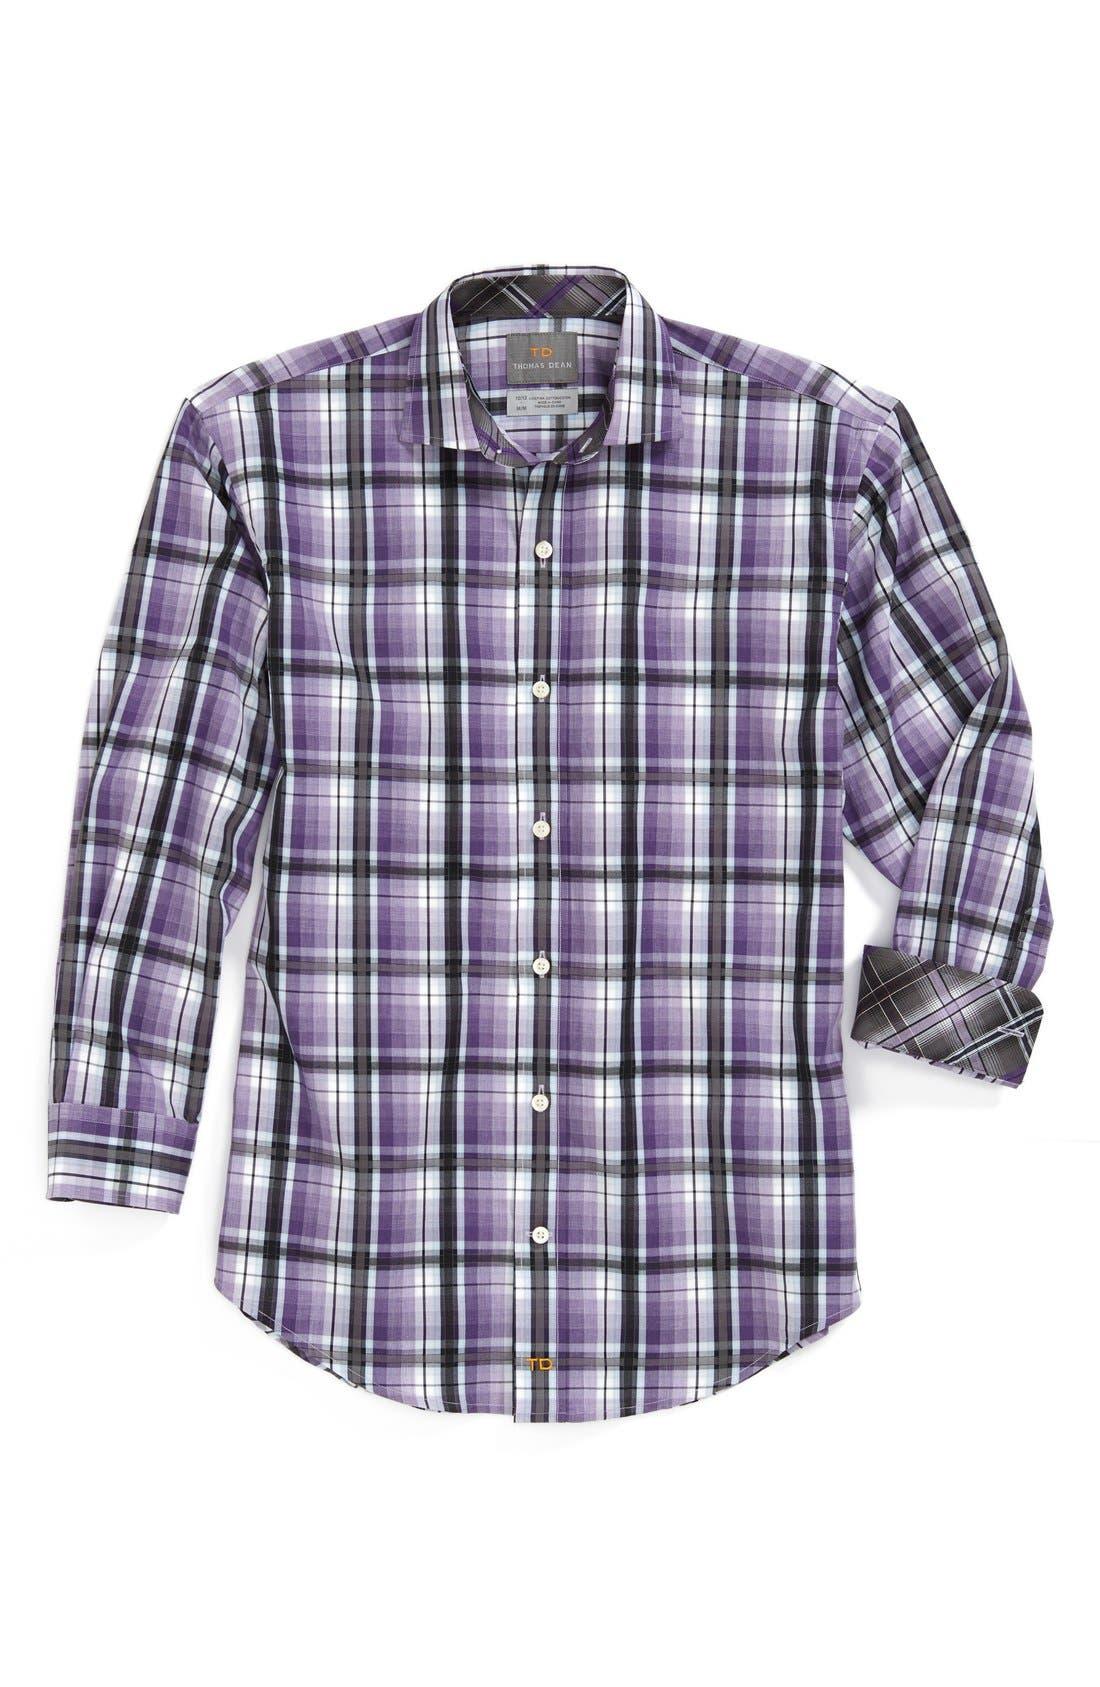 Alternate Image 1 Selected - Thomas Dean Plaid Cotton Poplin Dress Shirt (Big Boys)